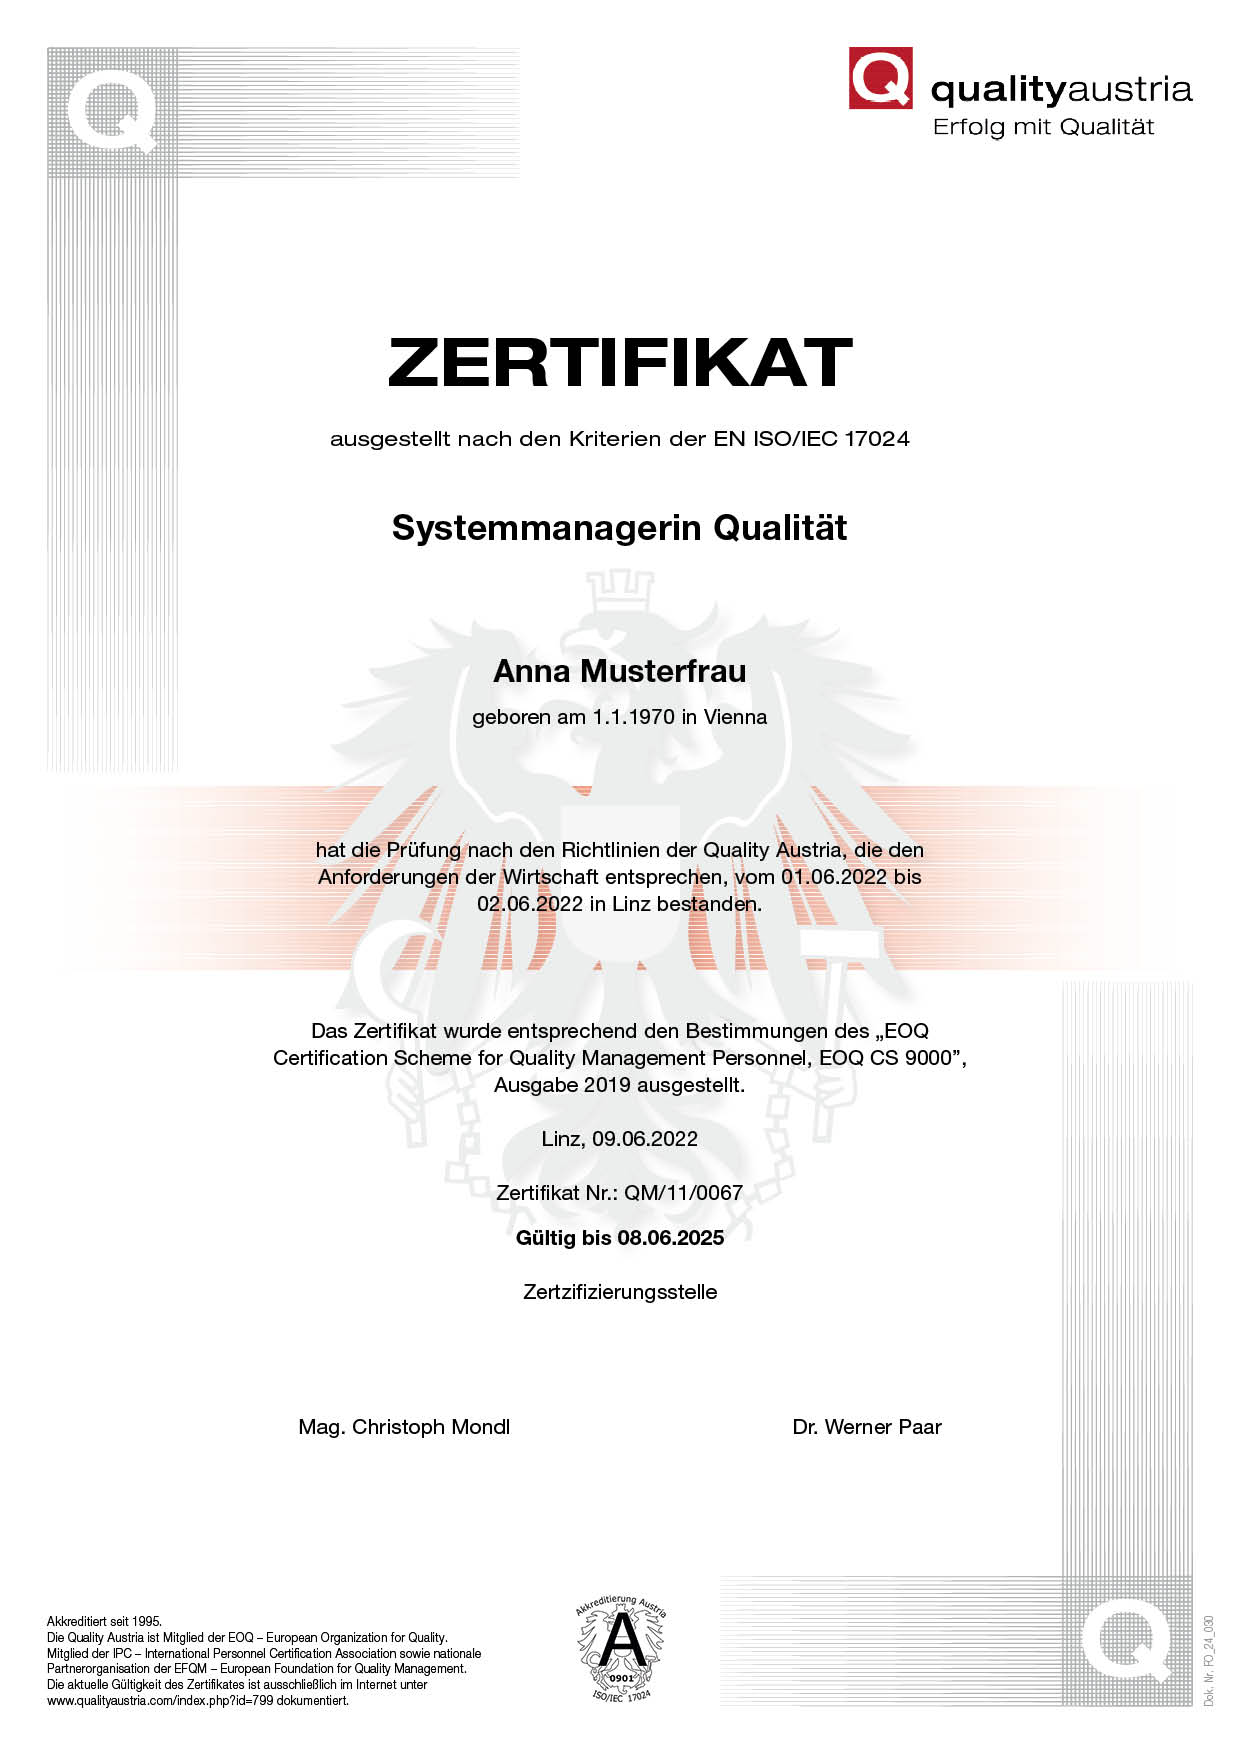 Zertifikate • Berufszertifikat • Teilnahme Zertifikate • 002